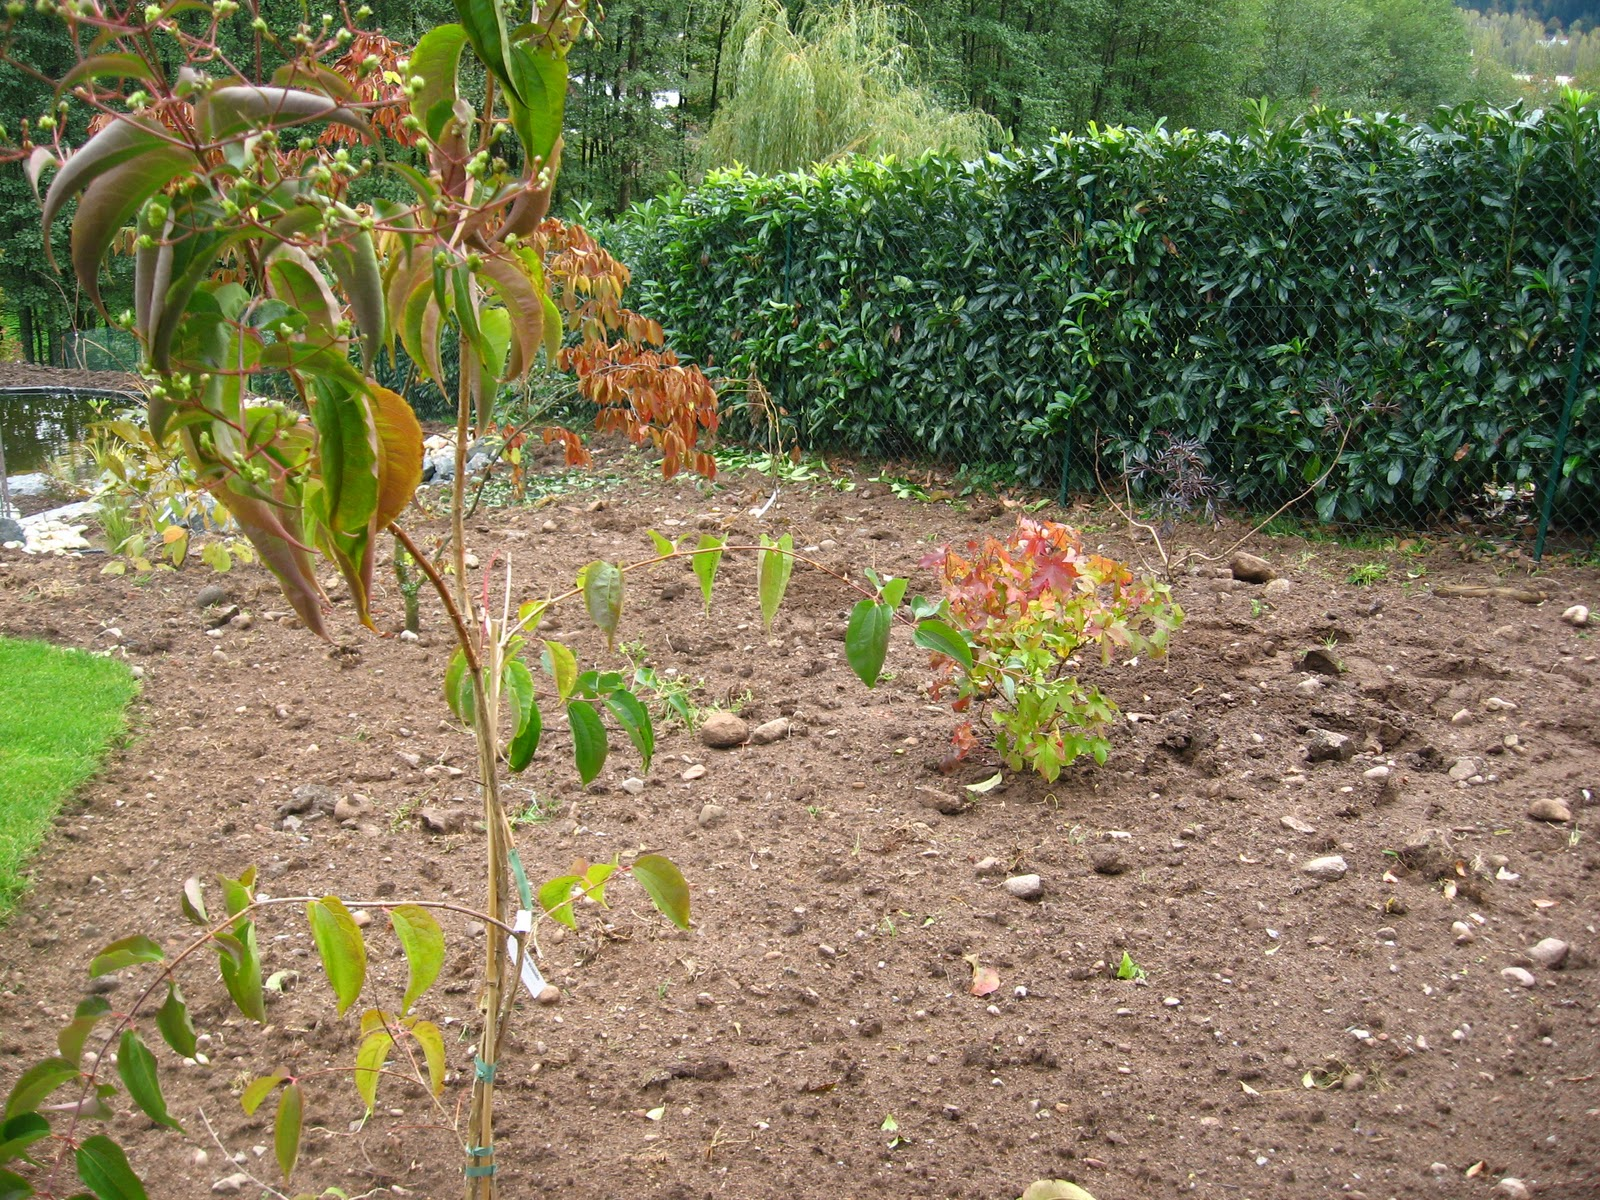 Le jardin du bois des dames semaine plantation for Plantations jardin